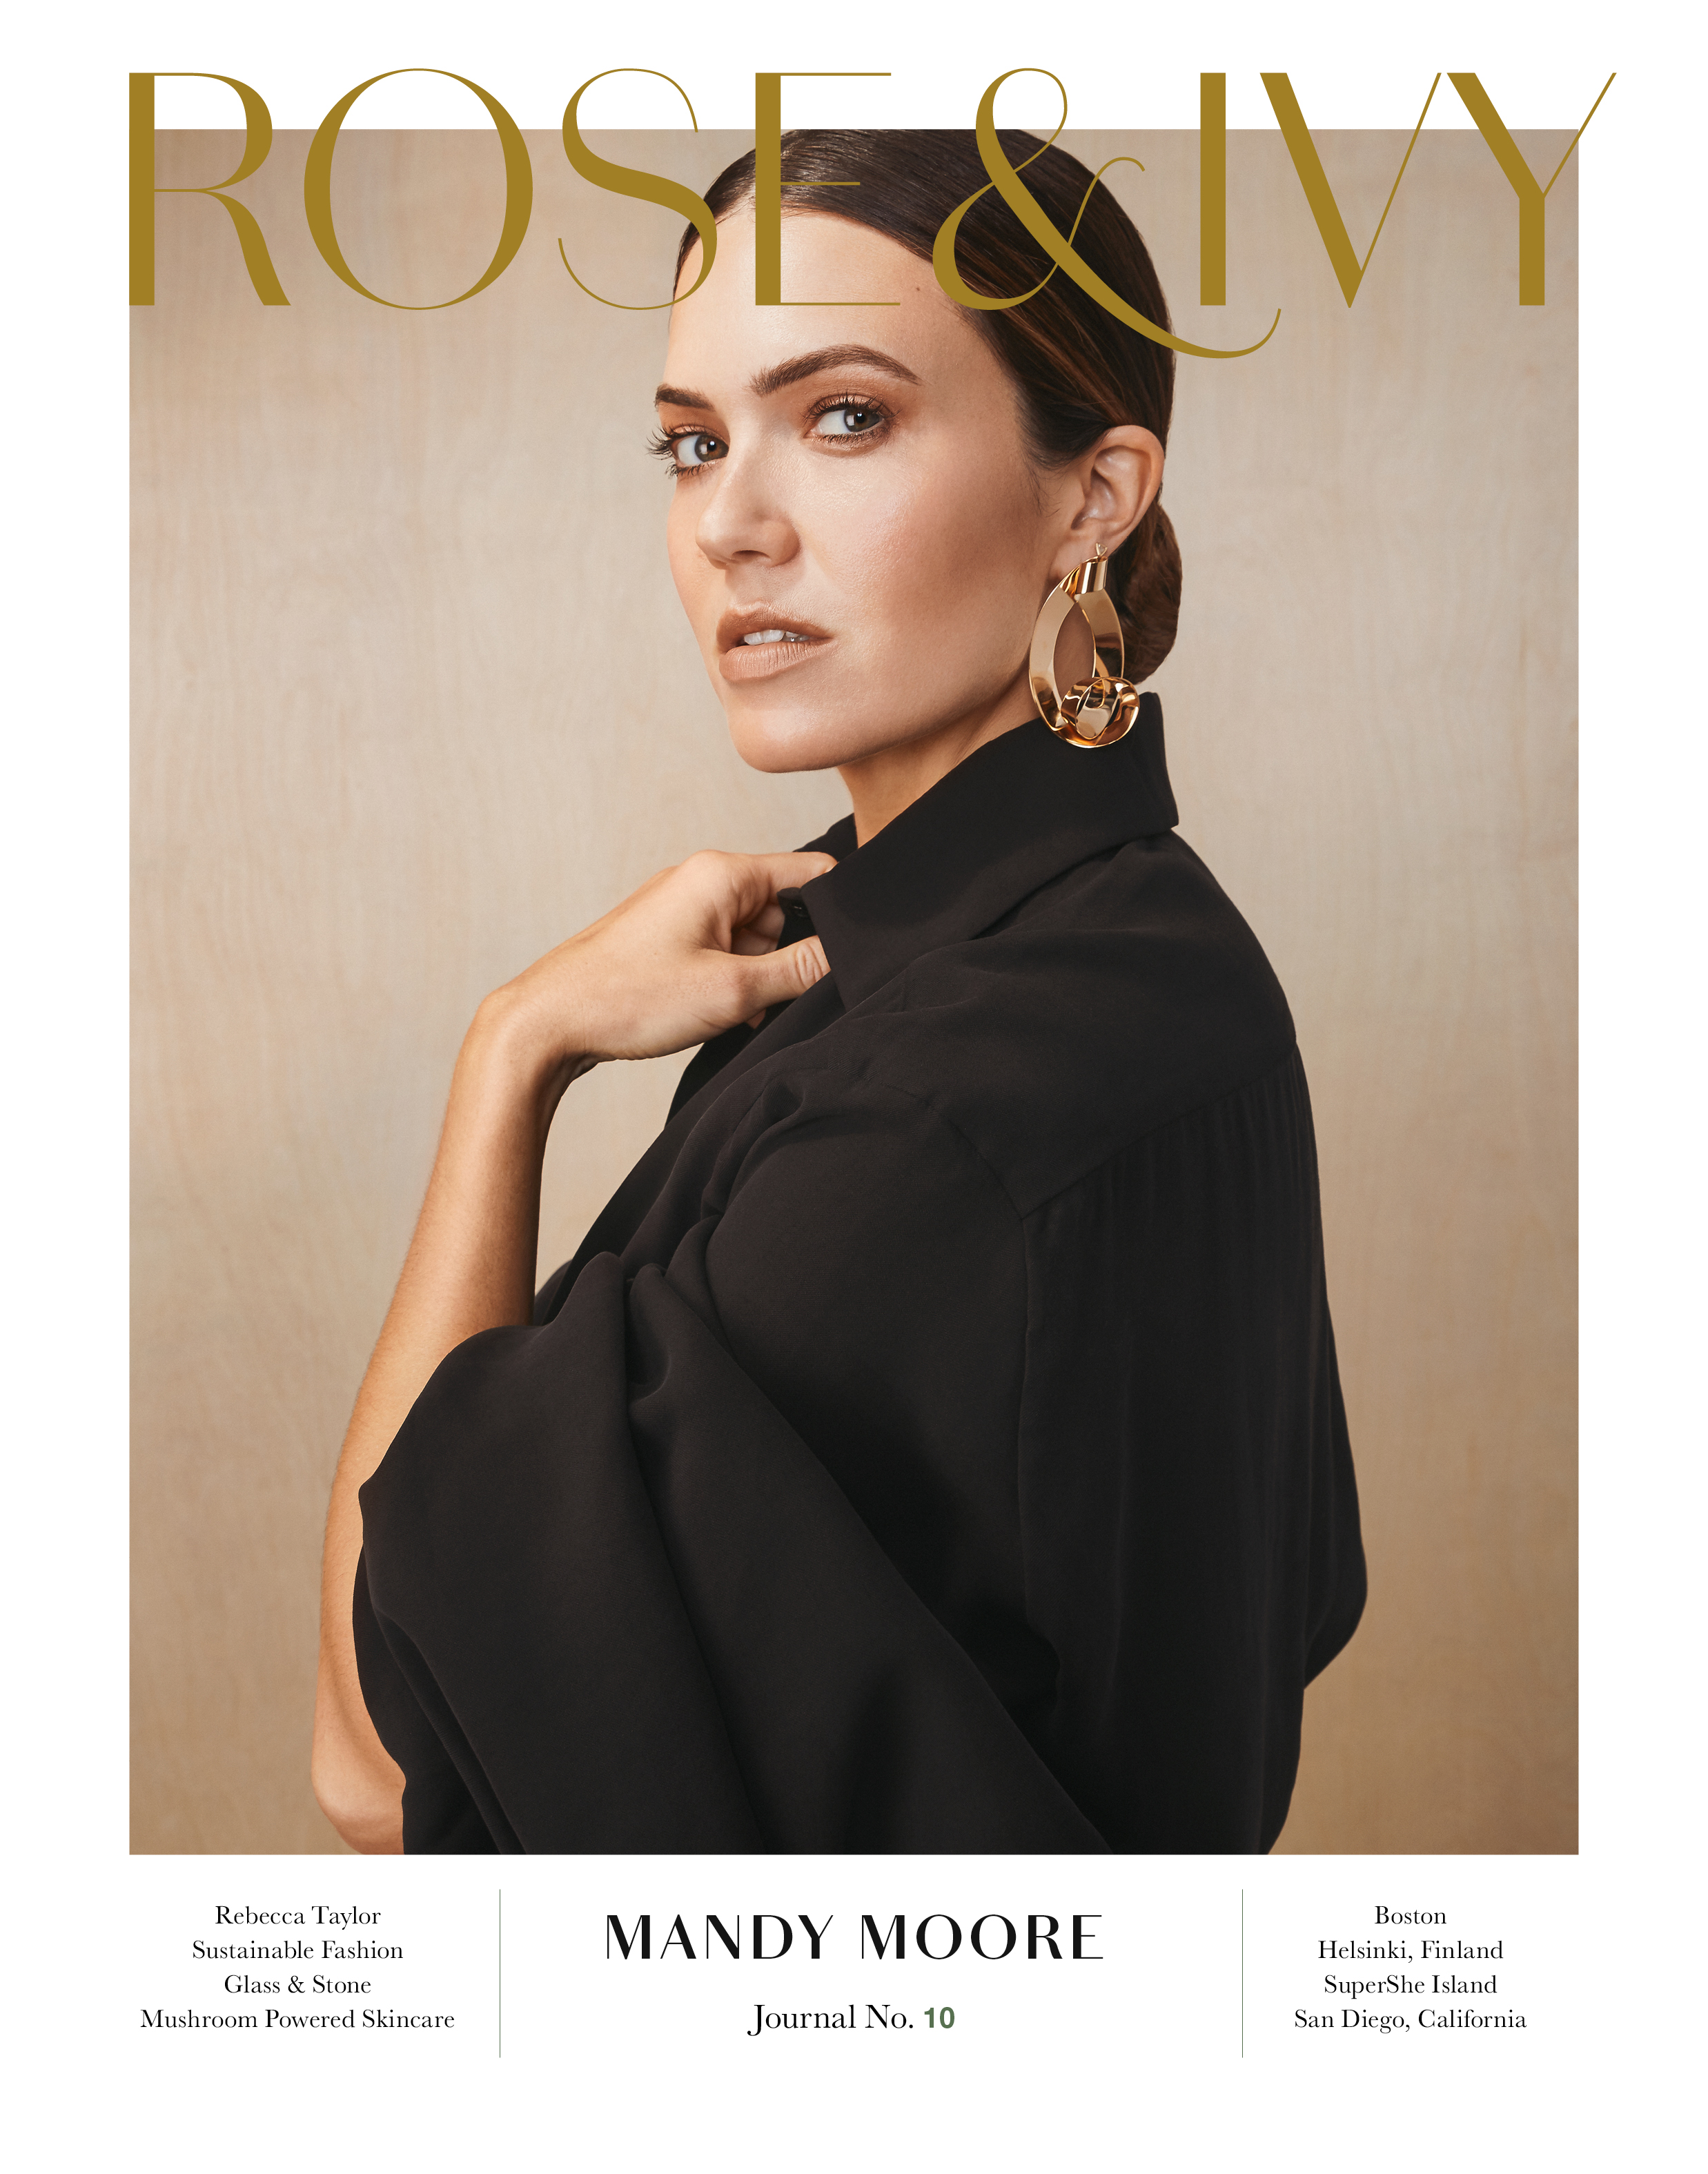 ROSE & IVY Journal NO.10 Starrring Mandy Moore